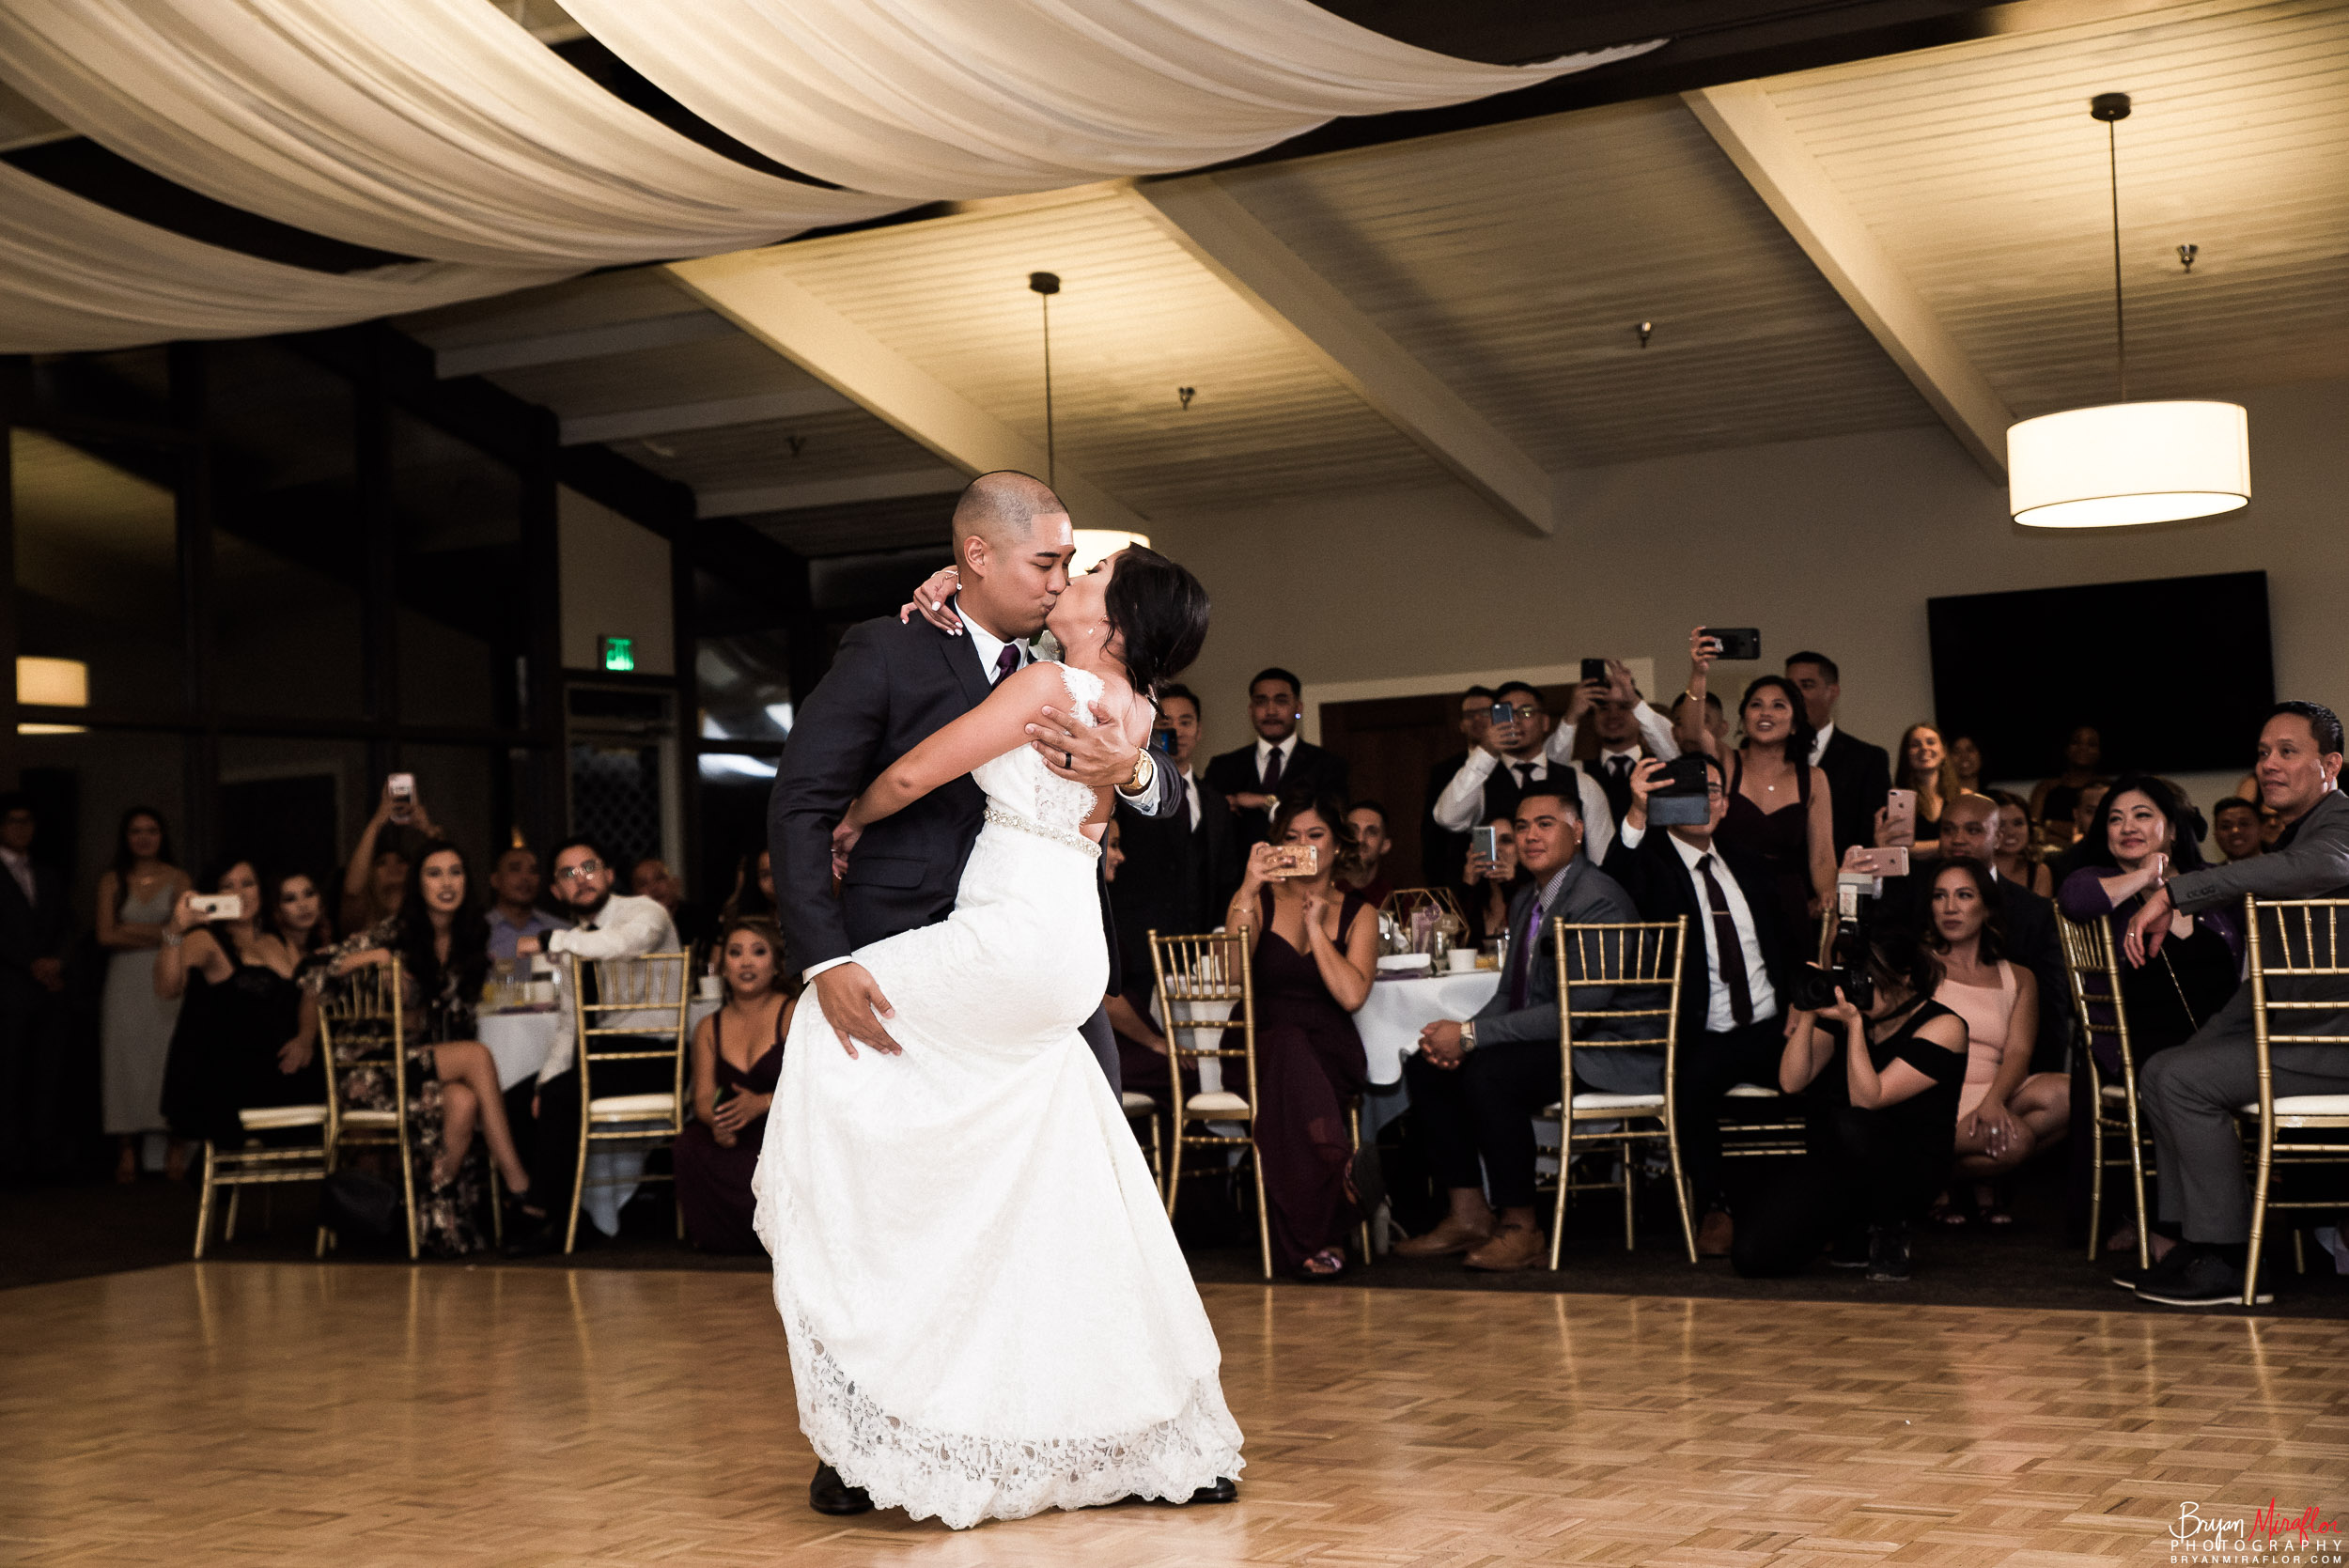 Bryan-Miraflor-Photography-Trisha-Dexter-Married-20170923-069.jpg